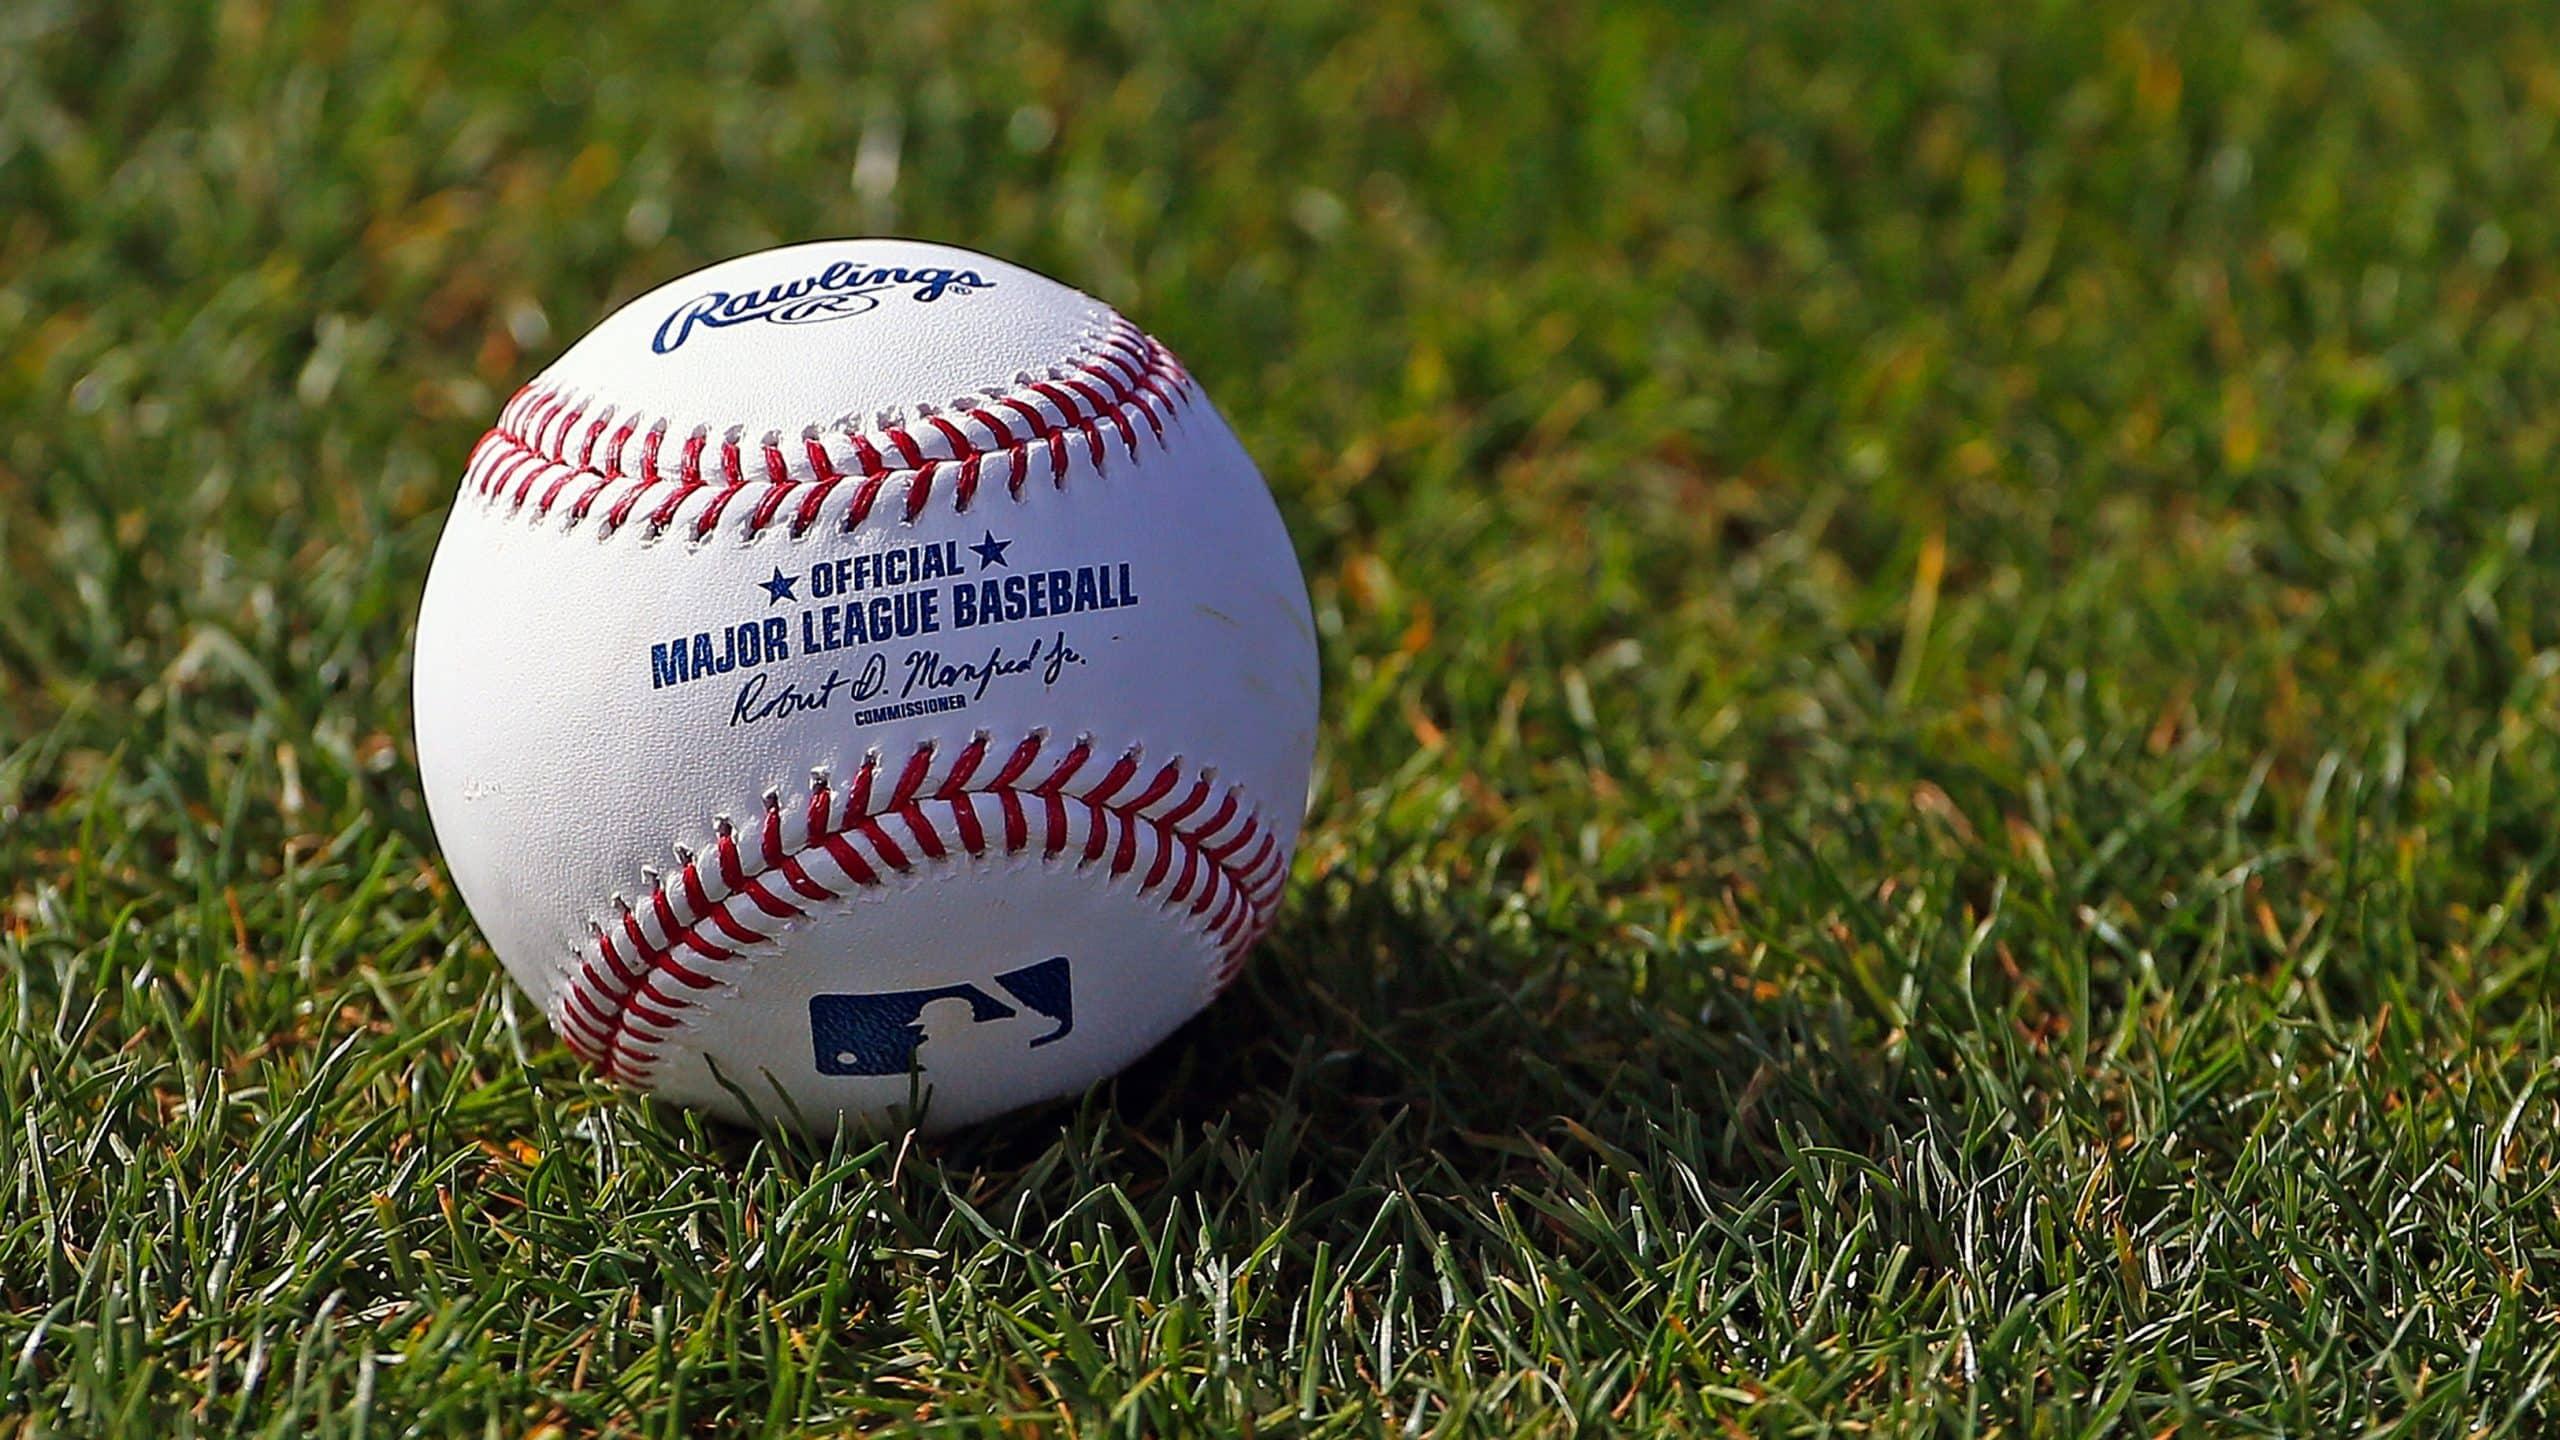 Opioid Addiction in MLB Major League Baseball